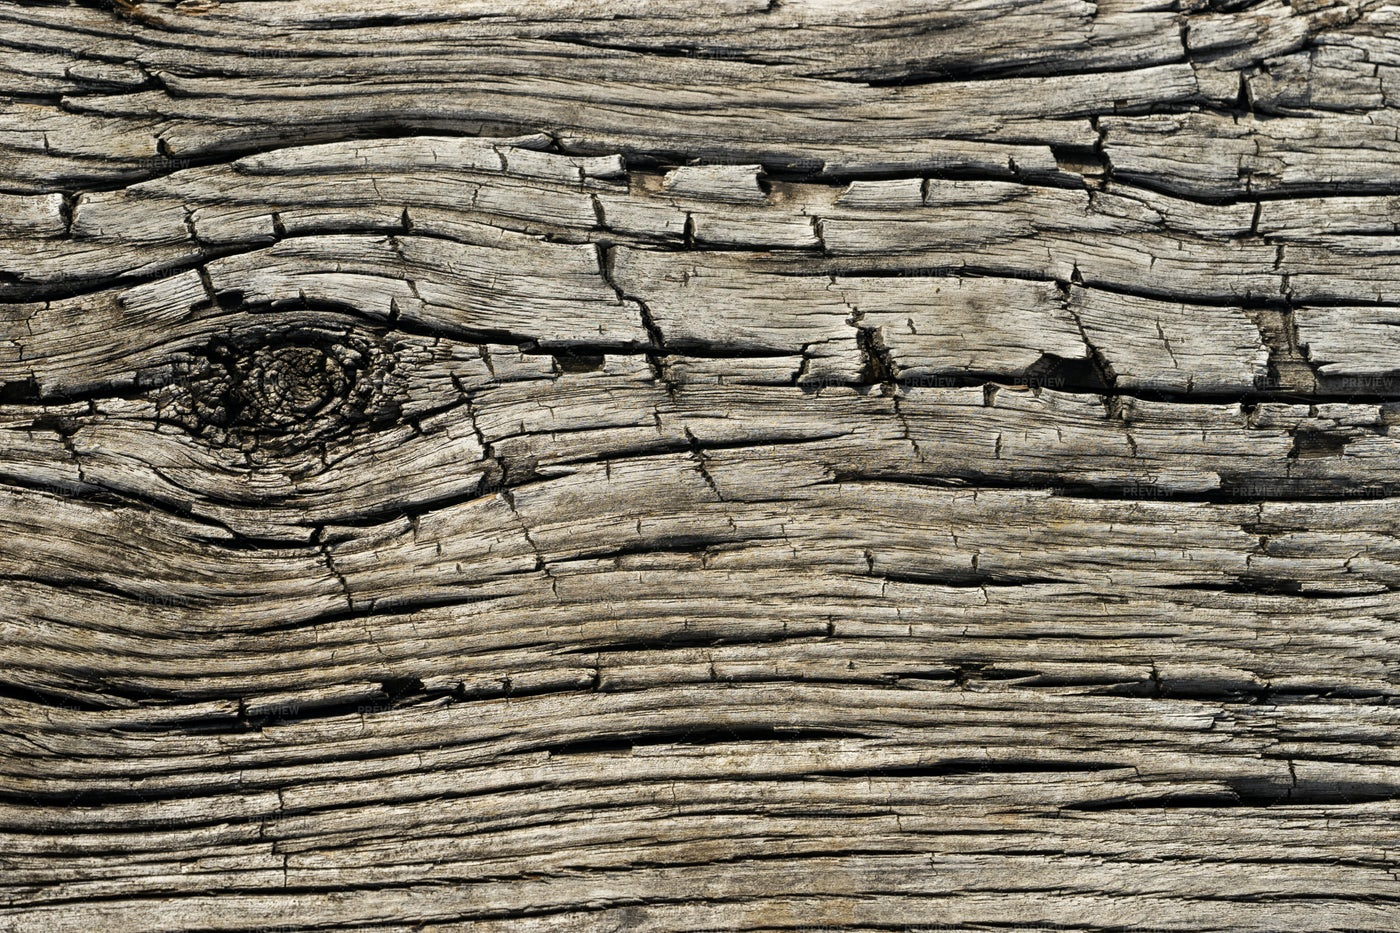 Snagged Wood: Stock Photos